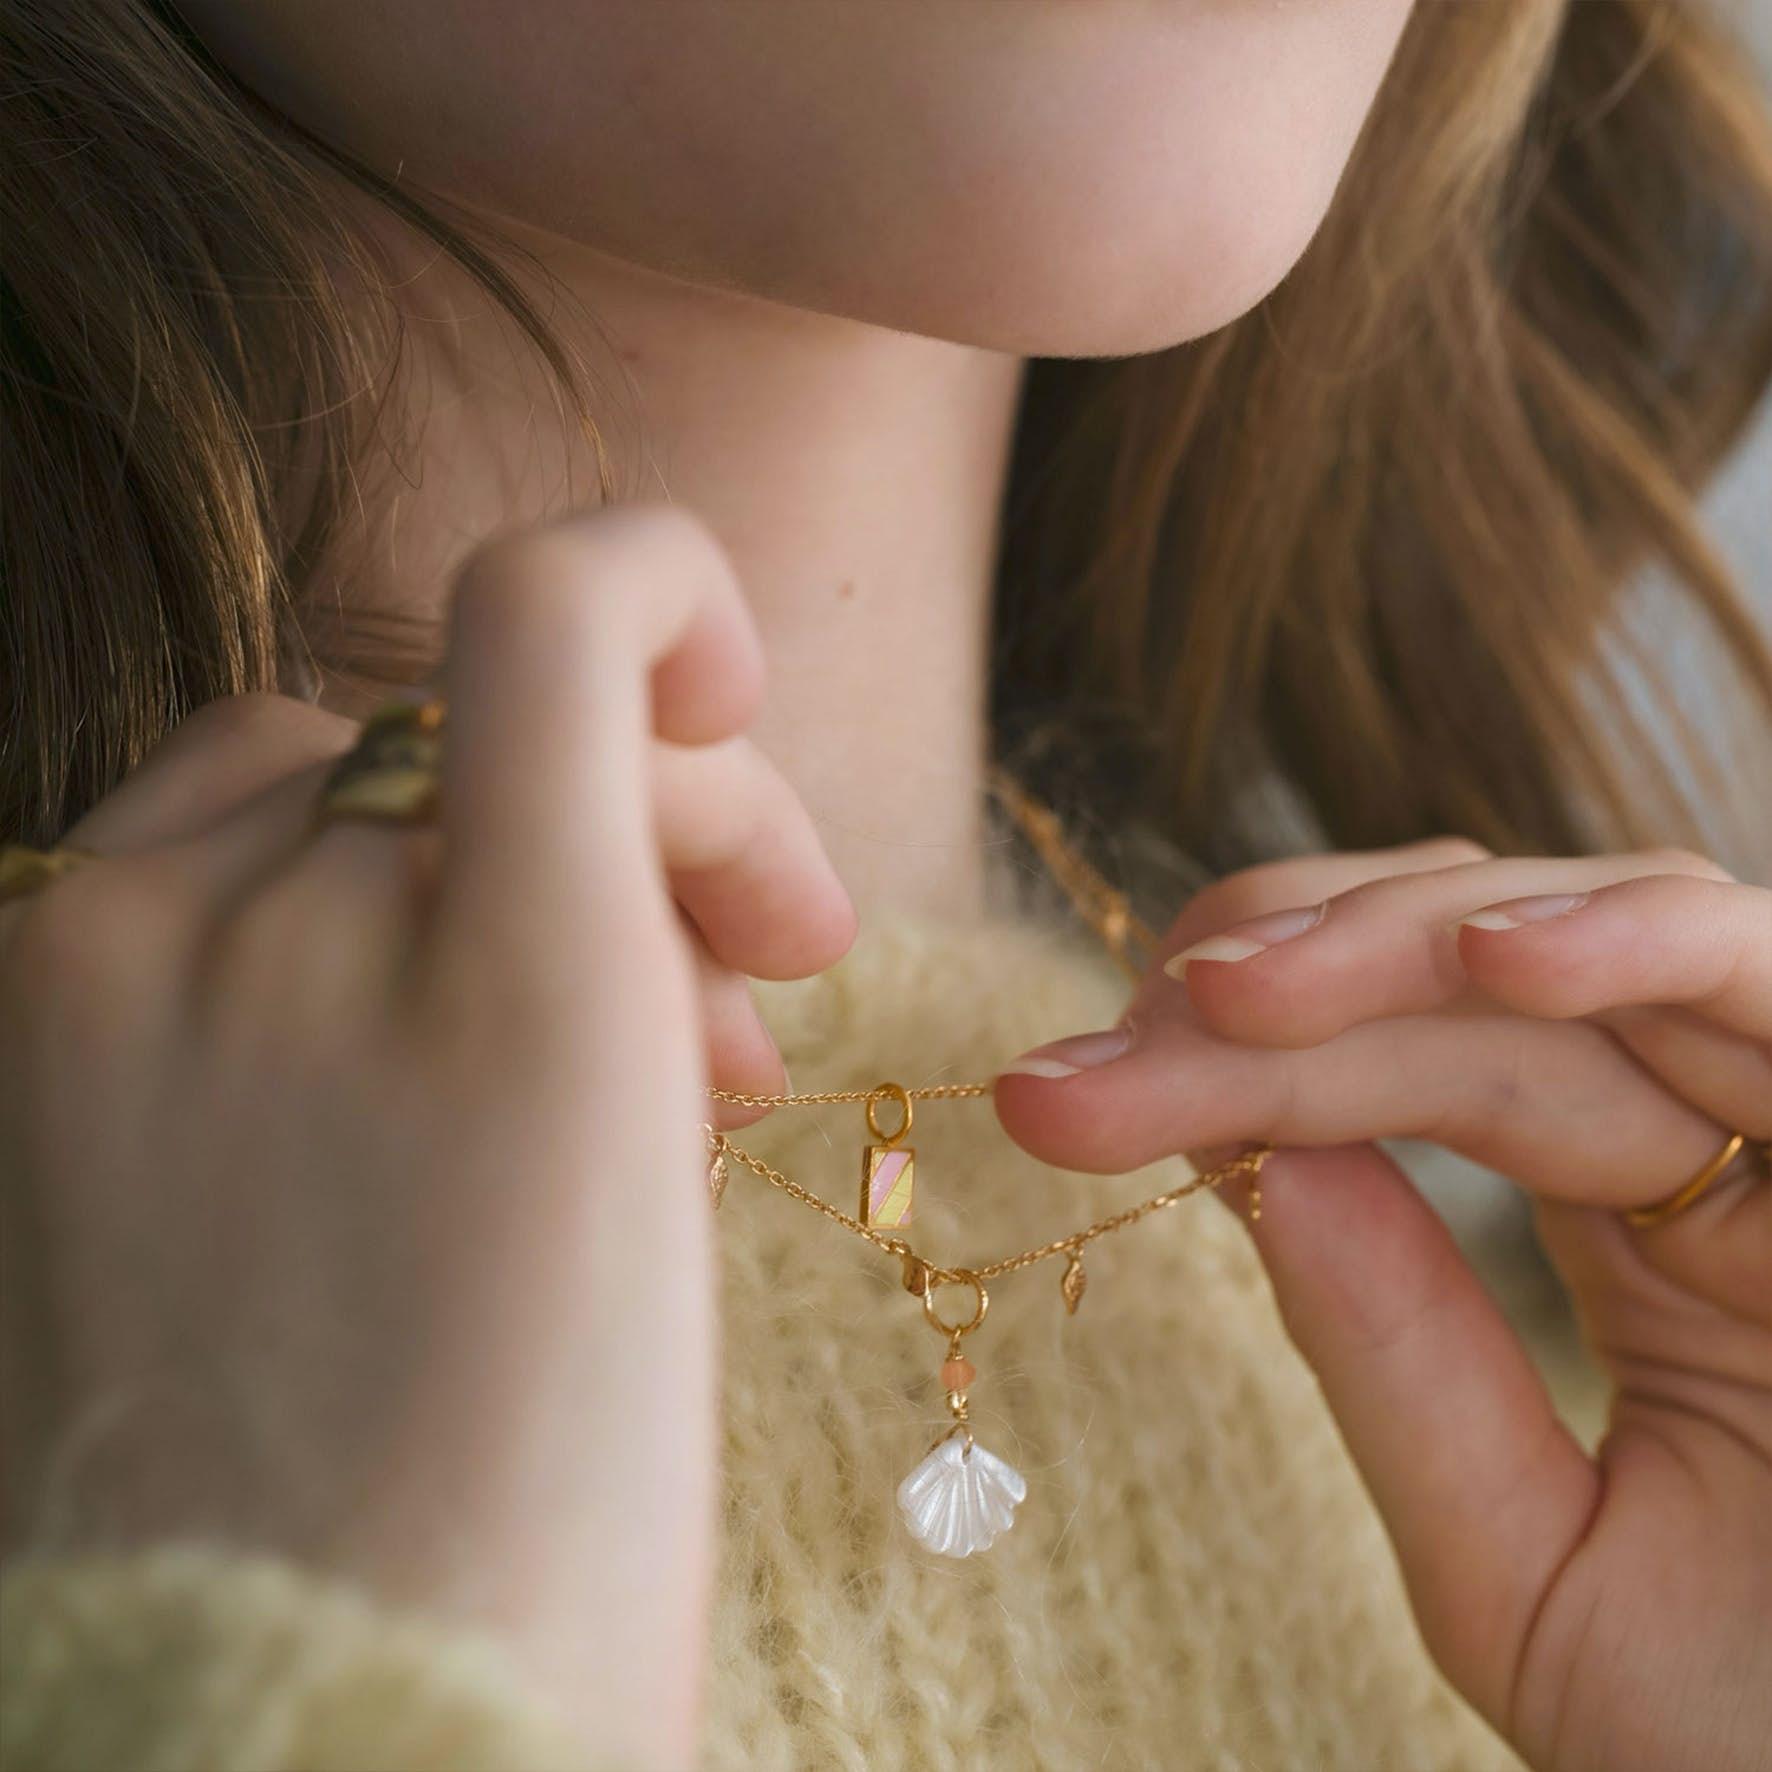 Petit Circus Pendant von STINE A Jewelry in Vergoldet-Silber Sterling 925